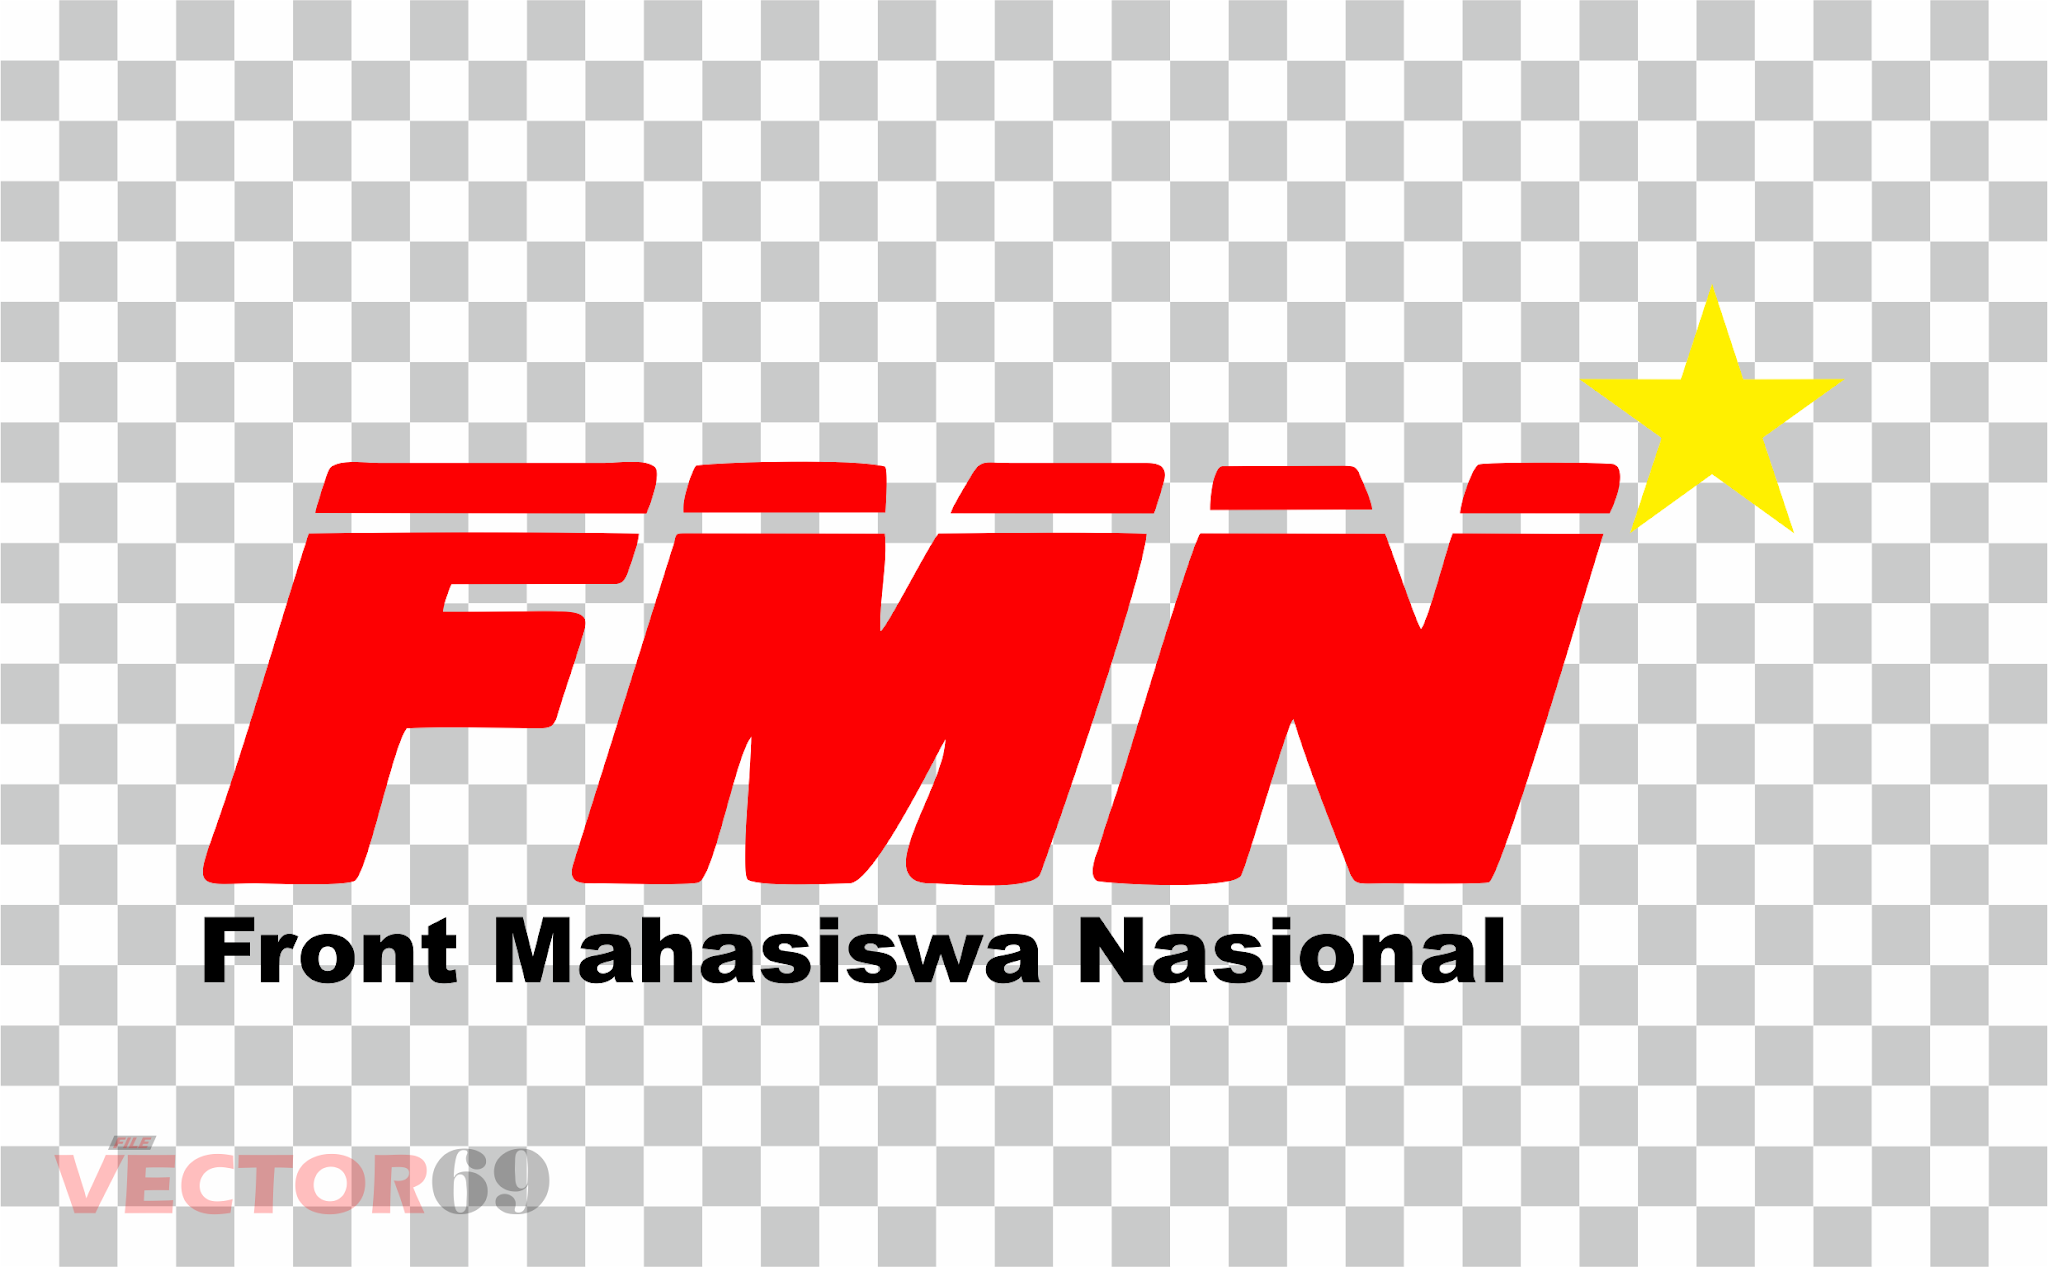 FMN (Front Mahasiswa Nasional) Logo - Download Vector File PNG (Portable Network Graphics)